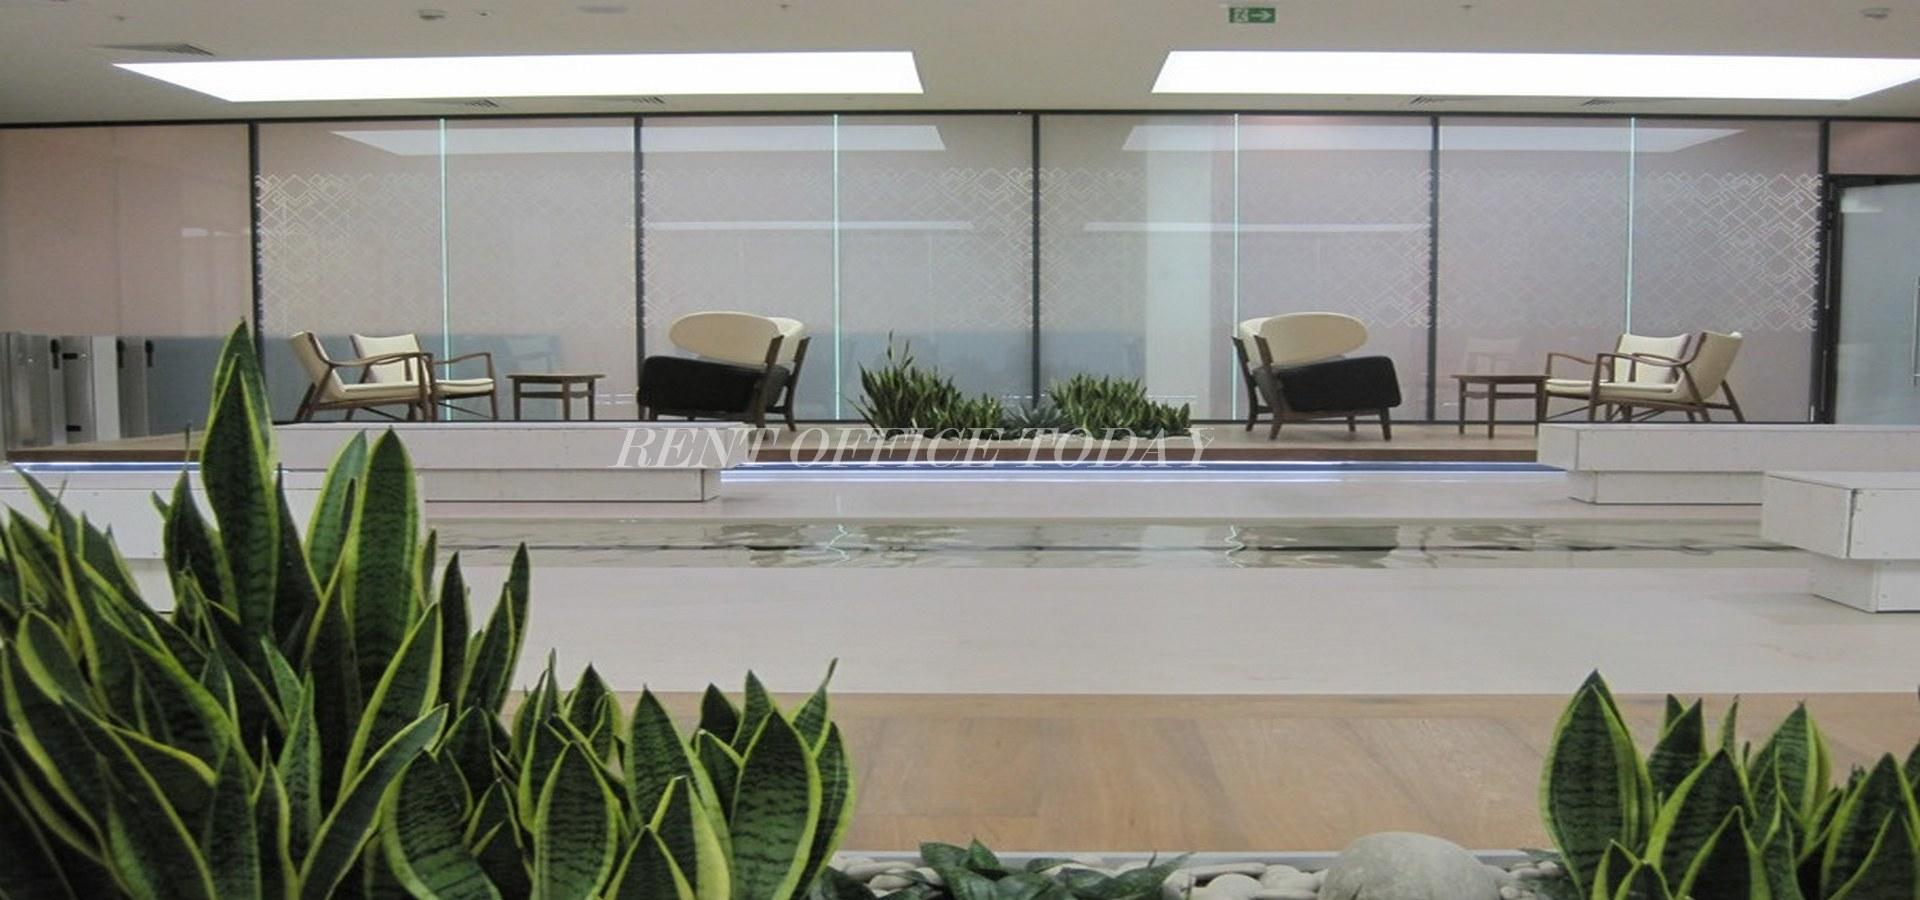 مكتب للايجار white stone-1